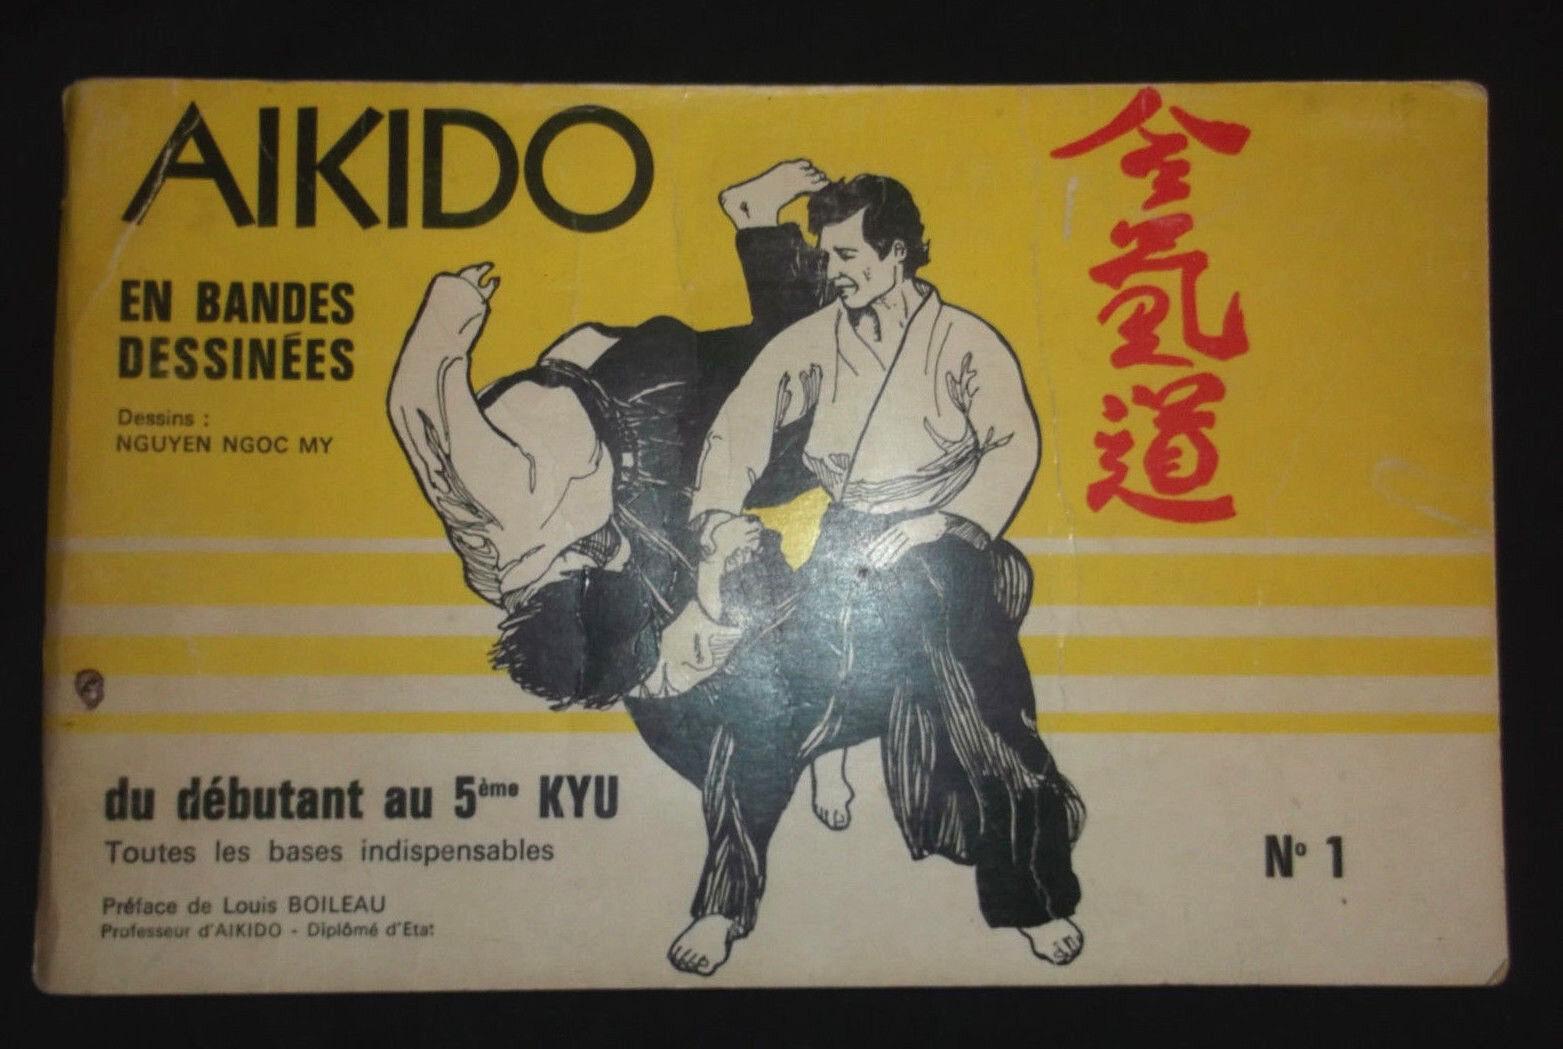 AIKIDO en Bandes dessinées n°1 - Ngoc-My Nguyen & Boileau - EO 1980